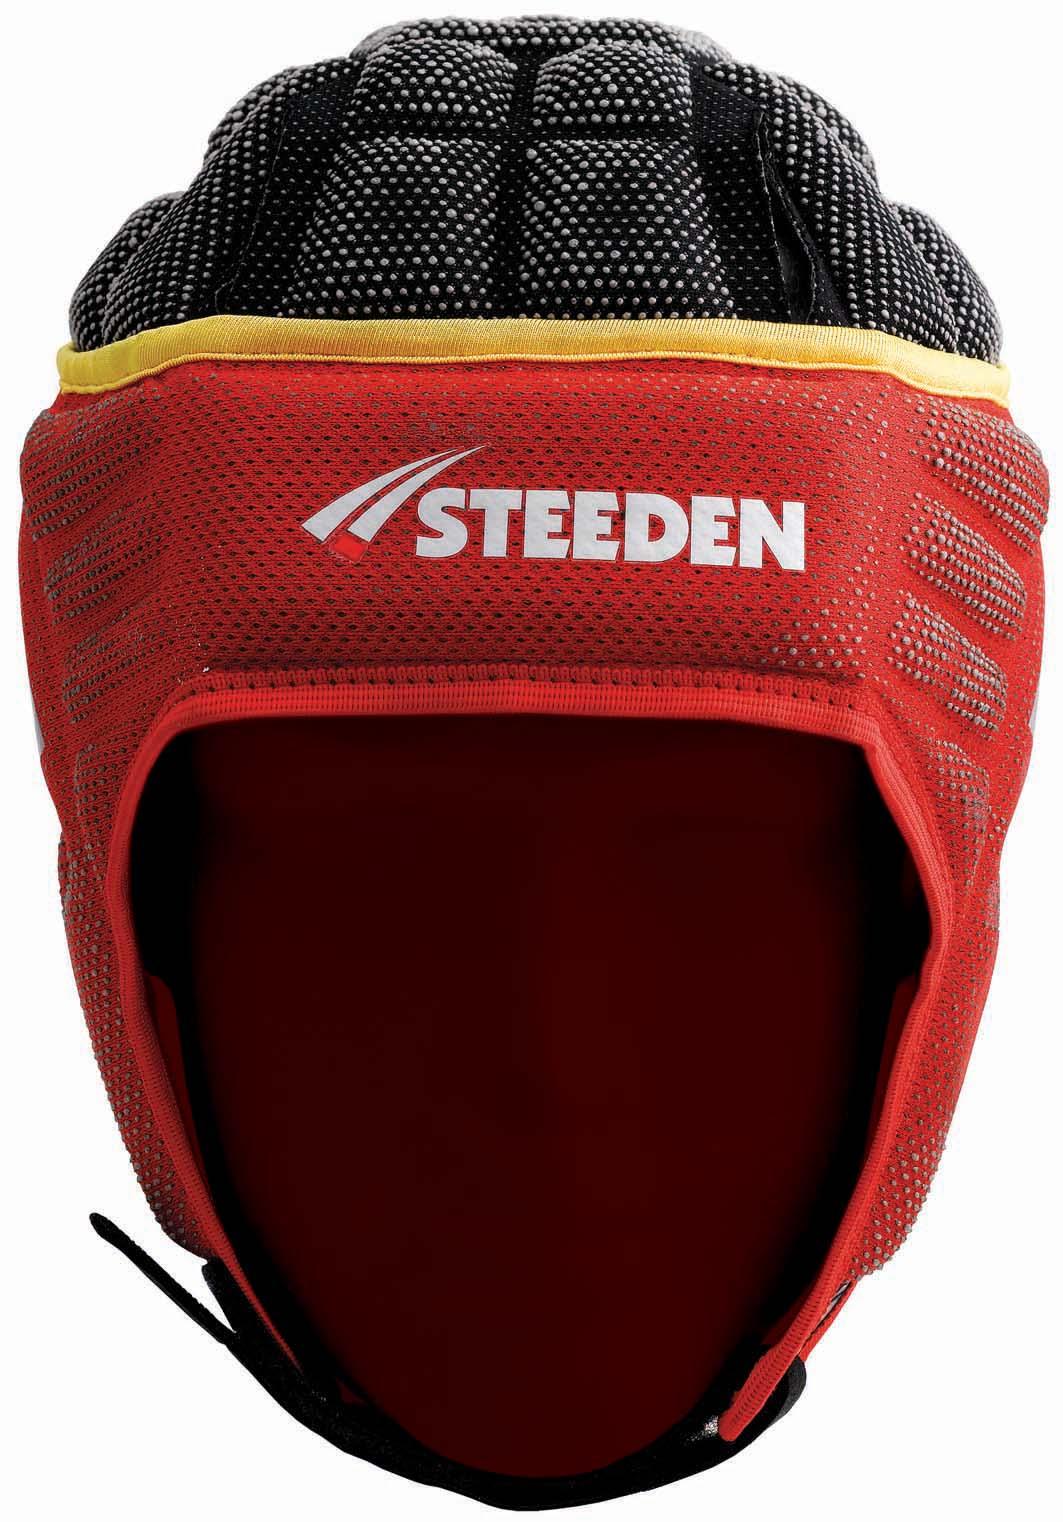 ST-RHINO MK2 HEADGEAR SNR (RED/YEL/BLK) - Steeden : SPORTS